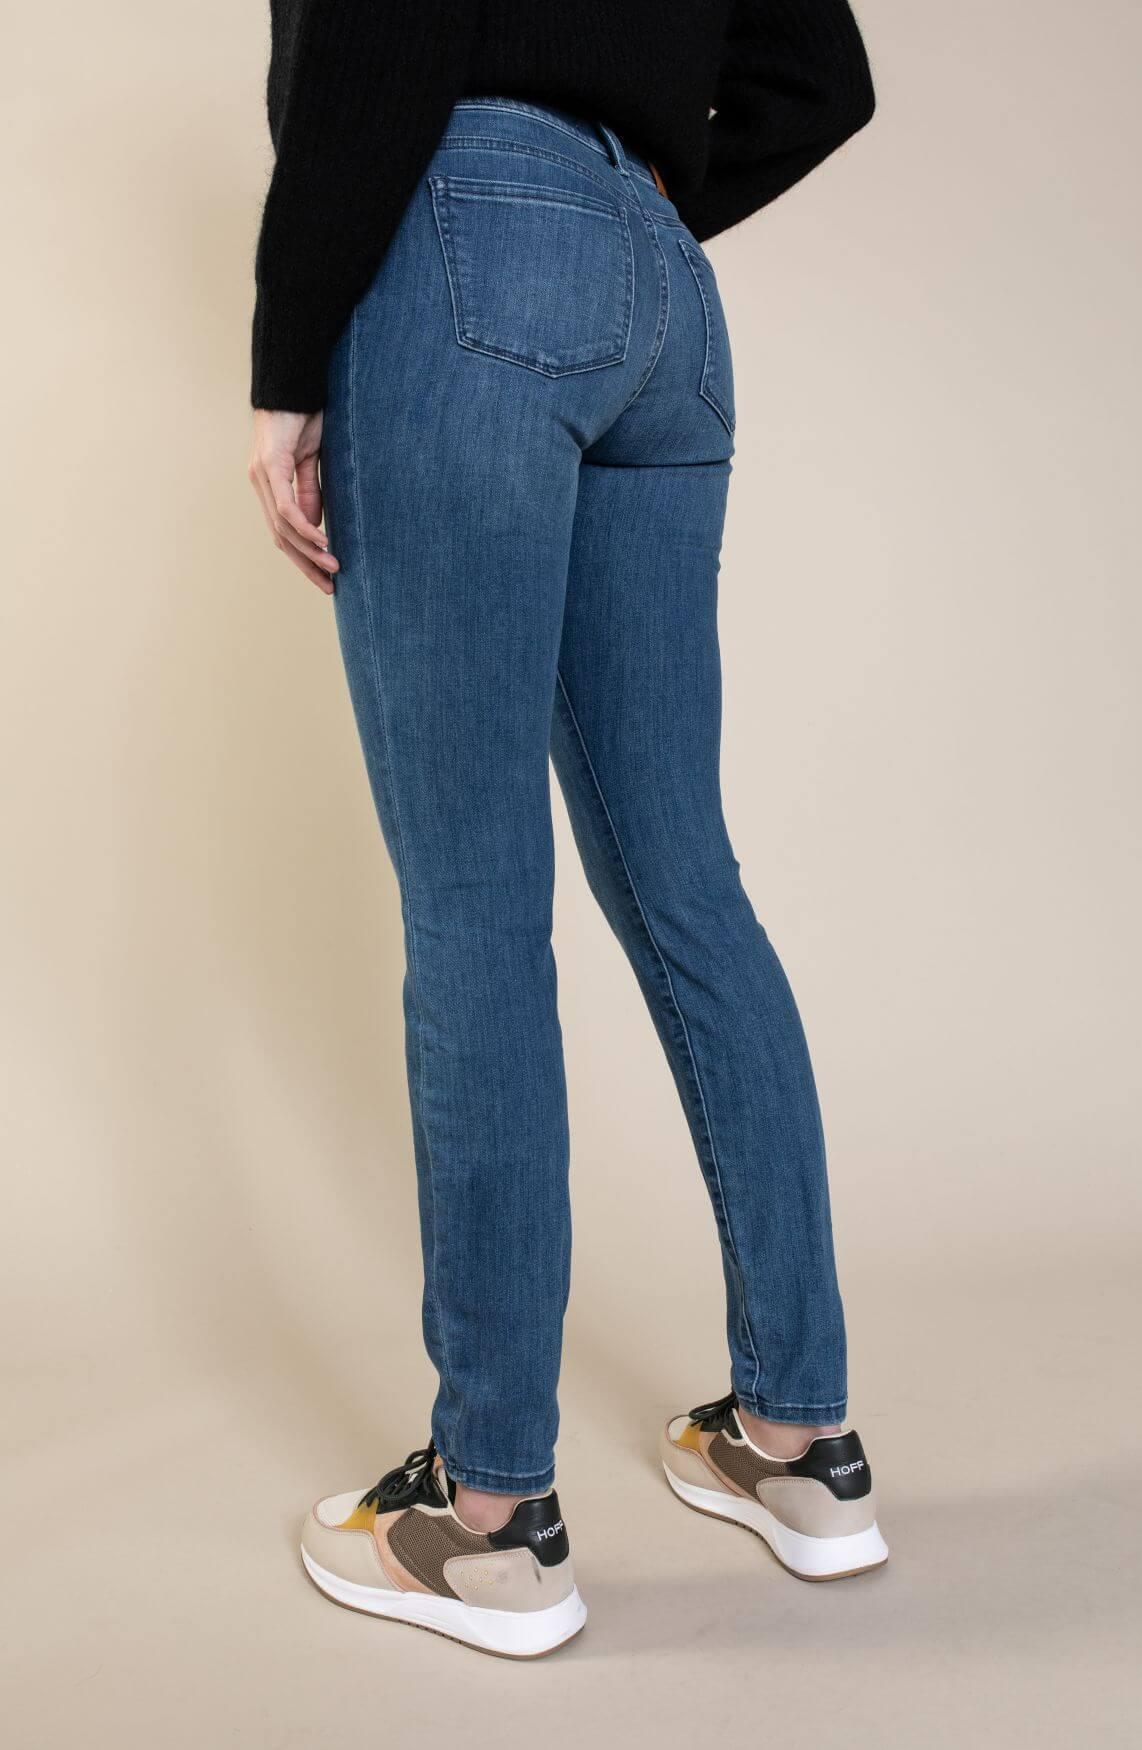 Tommy Hilfiger Dames Jeans Blauw